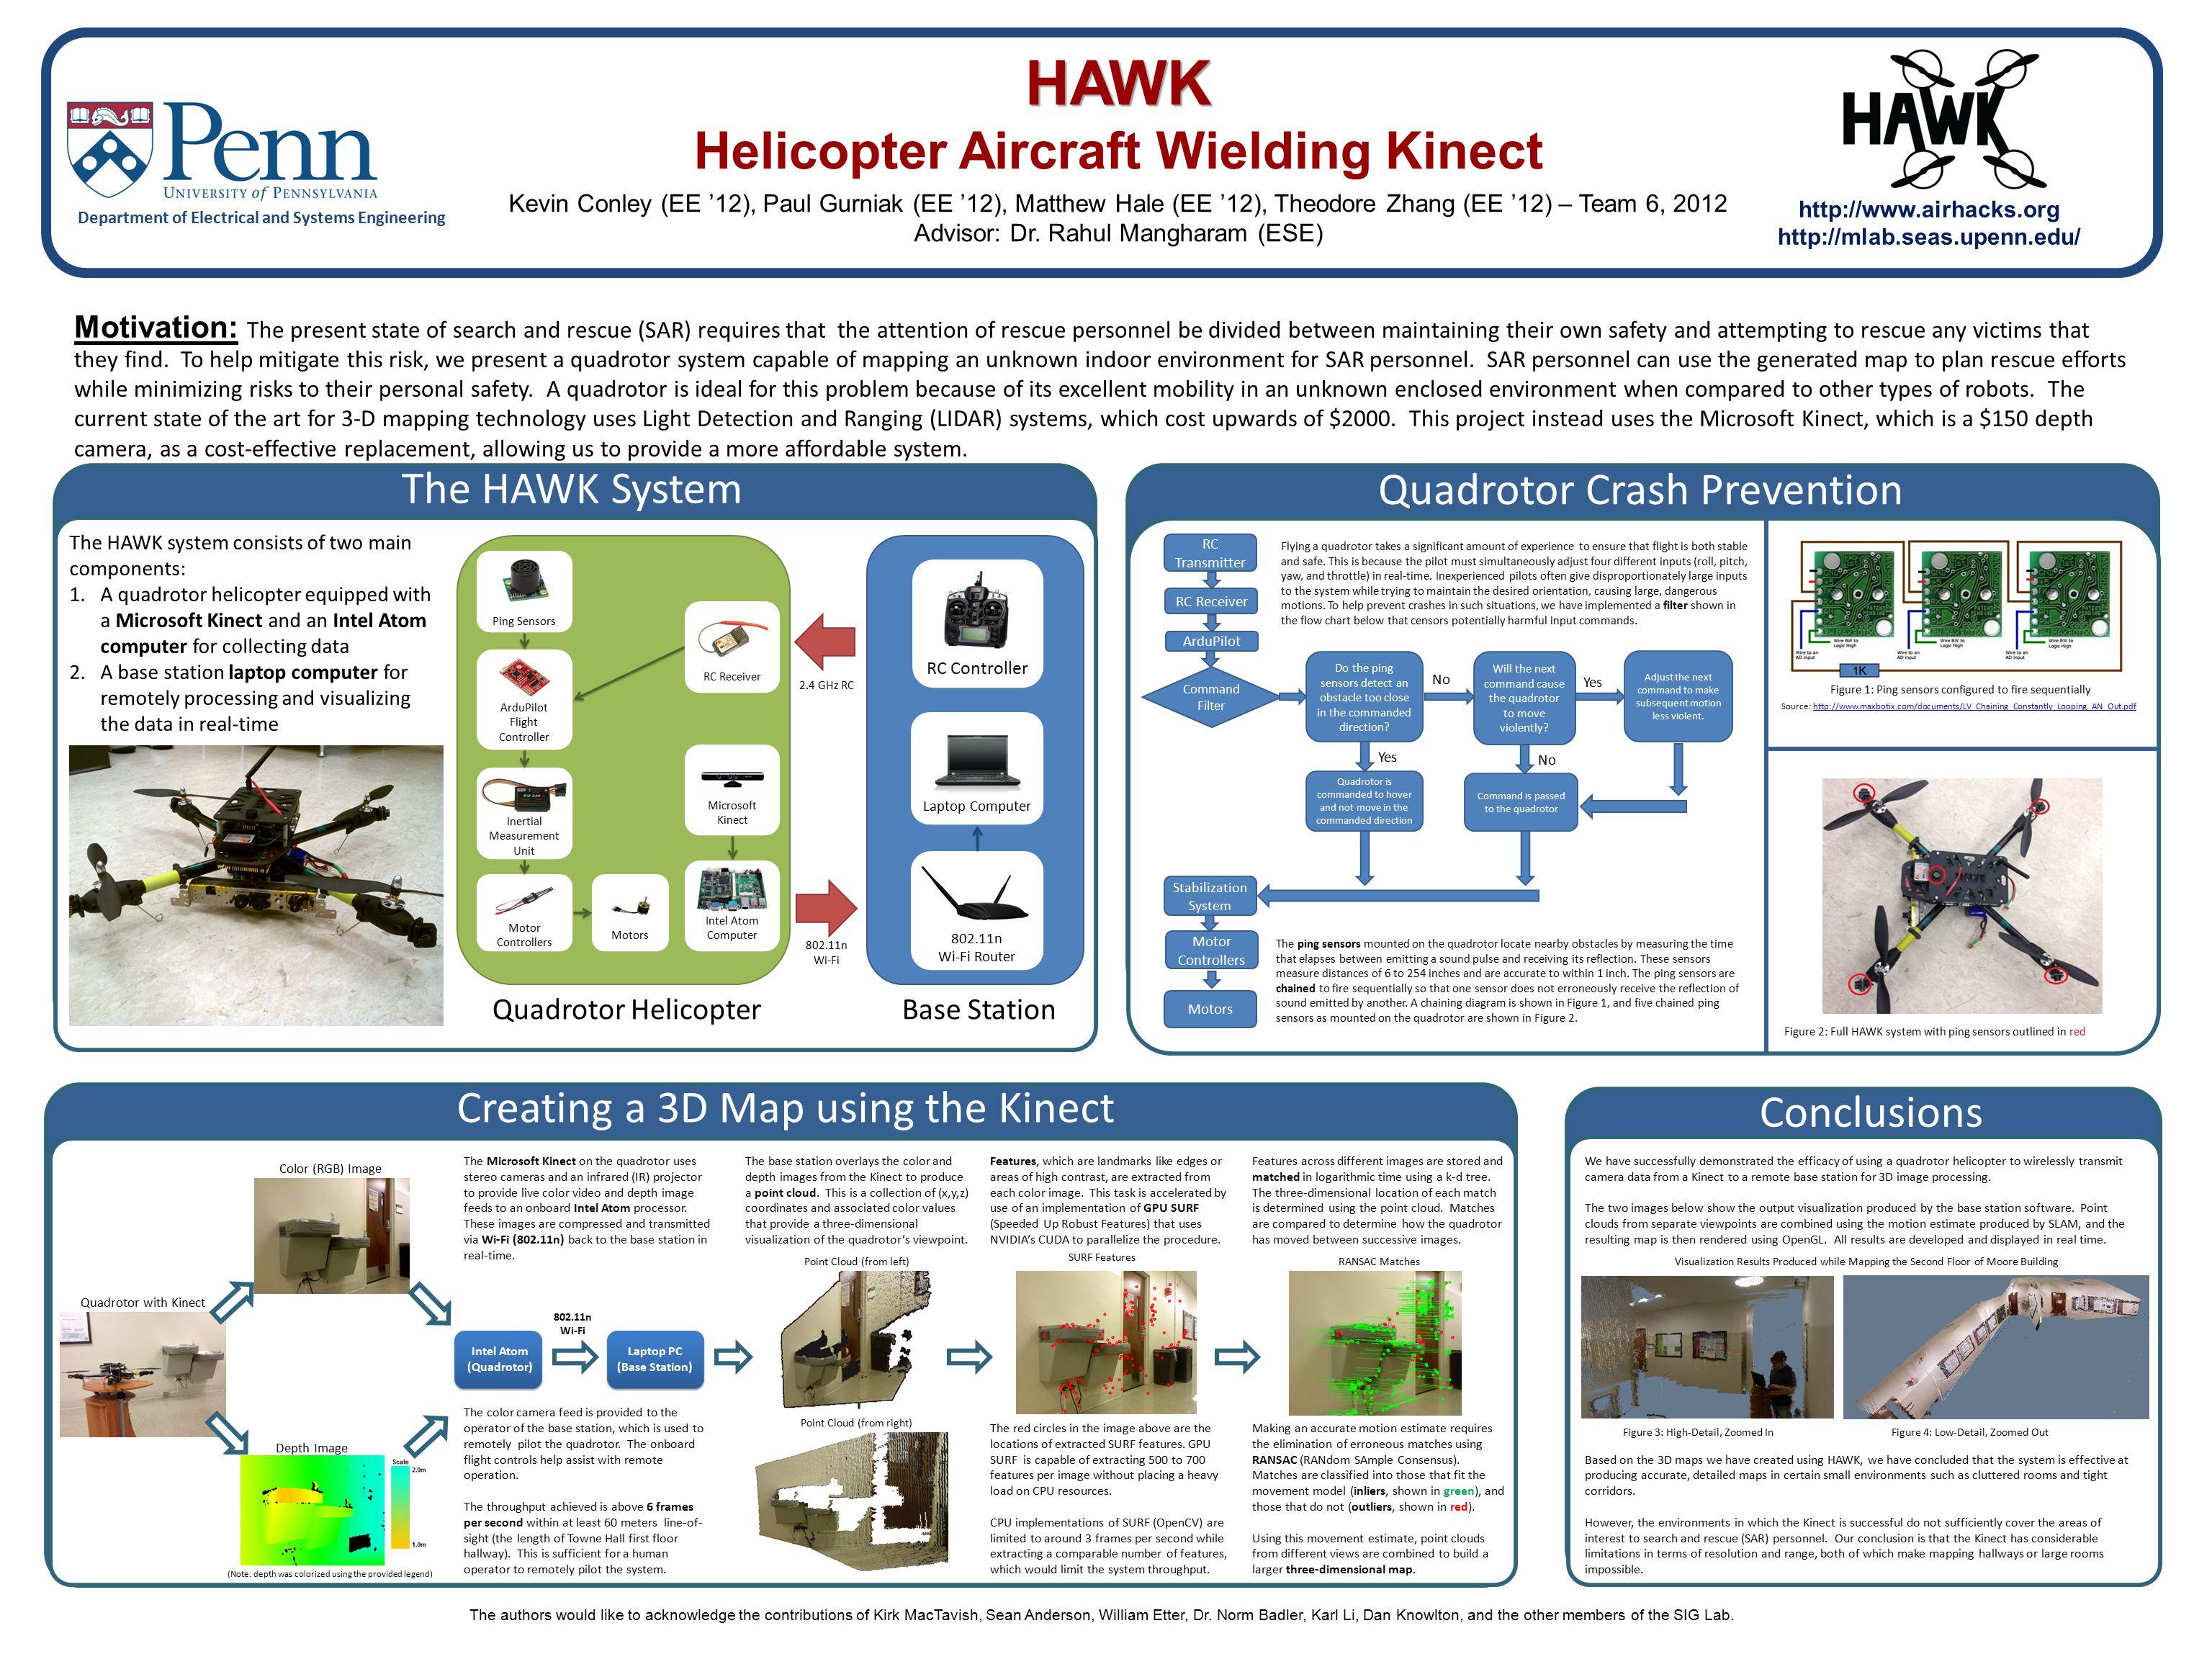 HAWK Helicopter Aircraft Wielding Kinect Kevin Conley (EE '12), Paul Gurniak (EE '12), Matthew Hale (EE '12), Theodore Zhang (EE '12) – Team 6, 2012 Advisor: Dr.